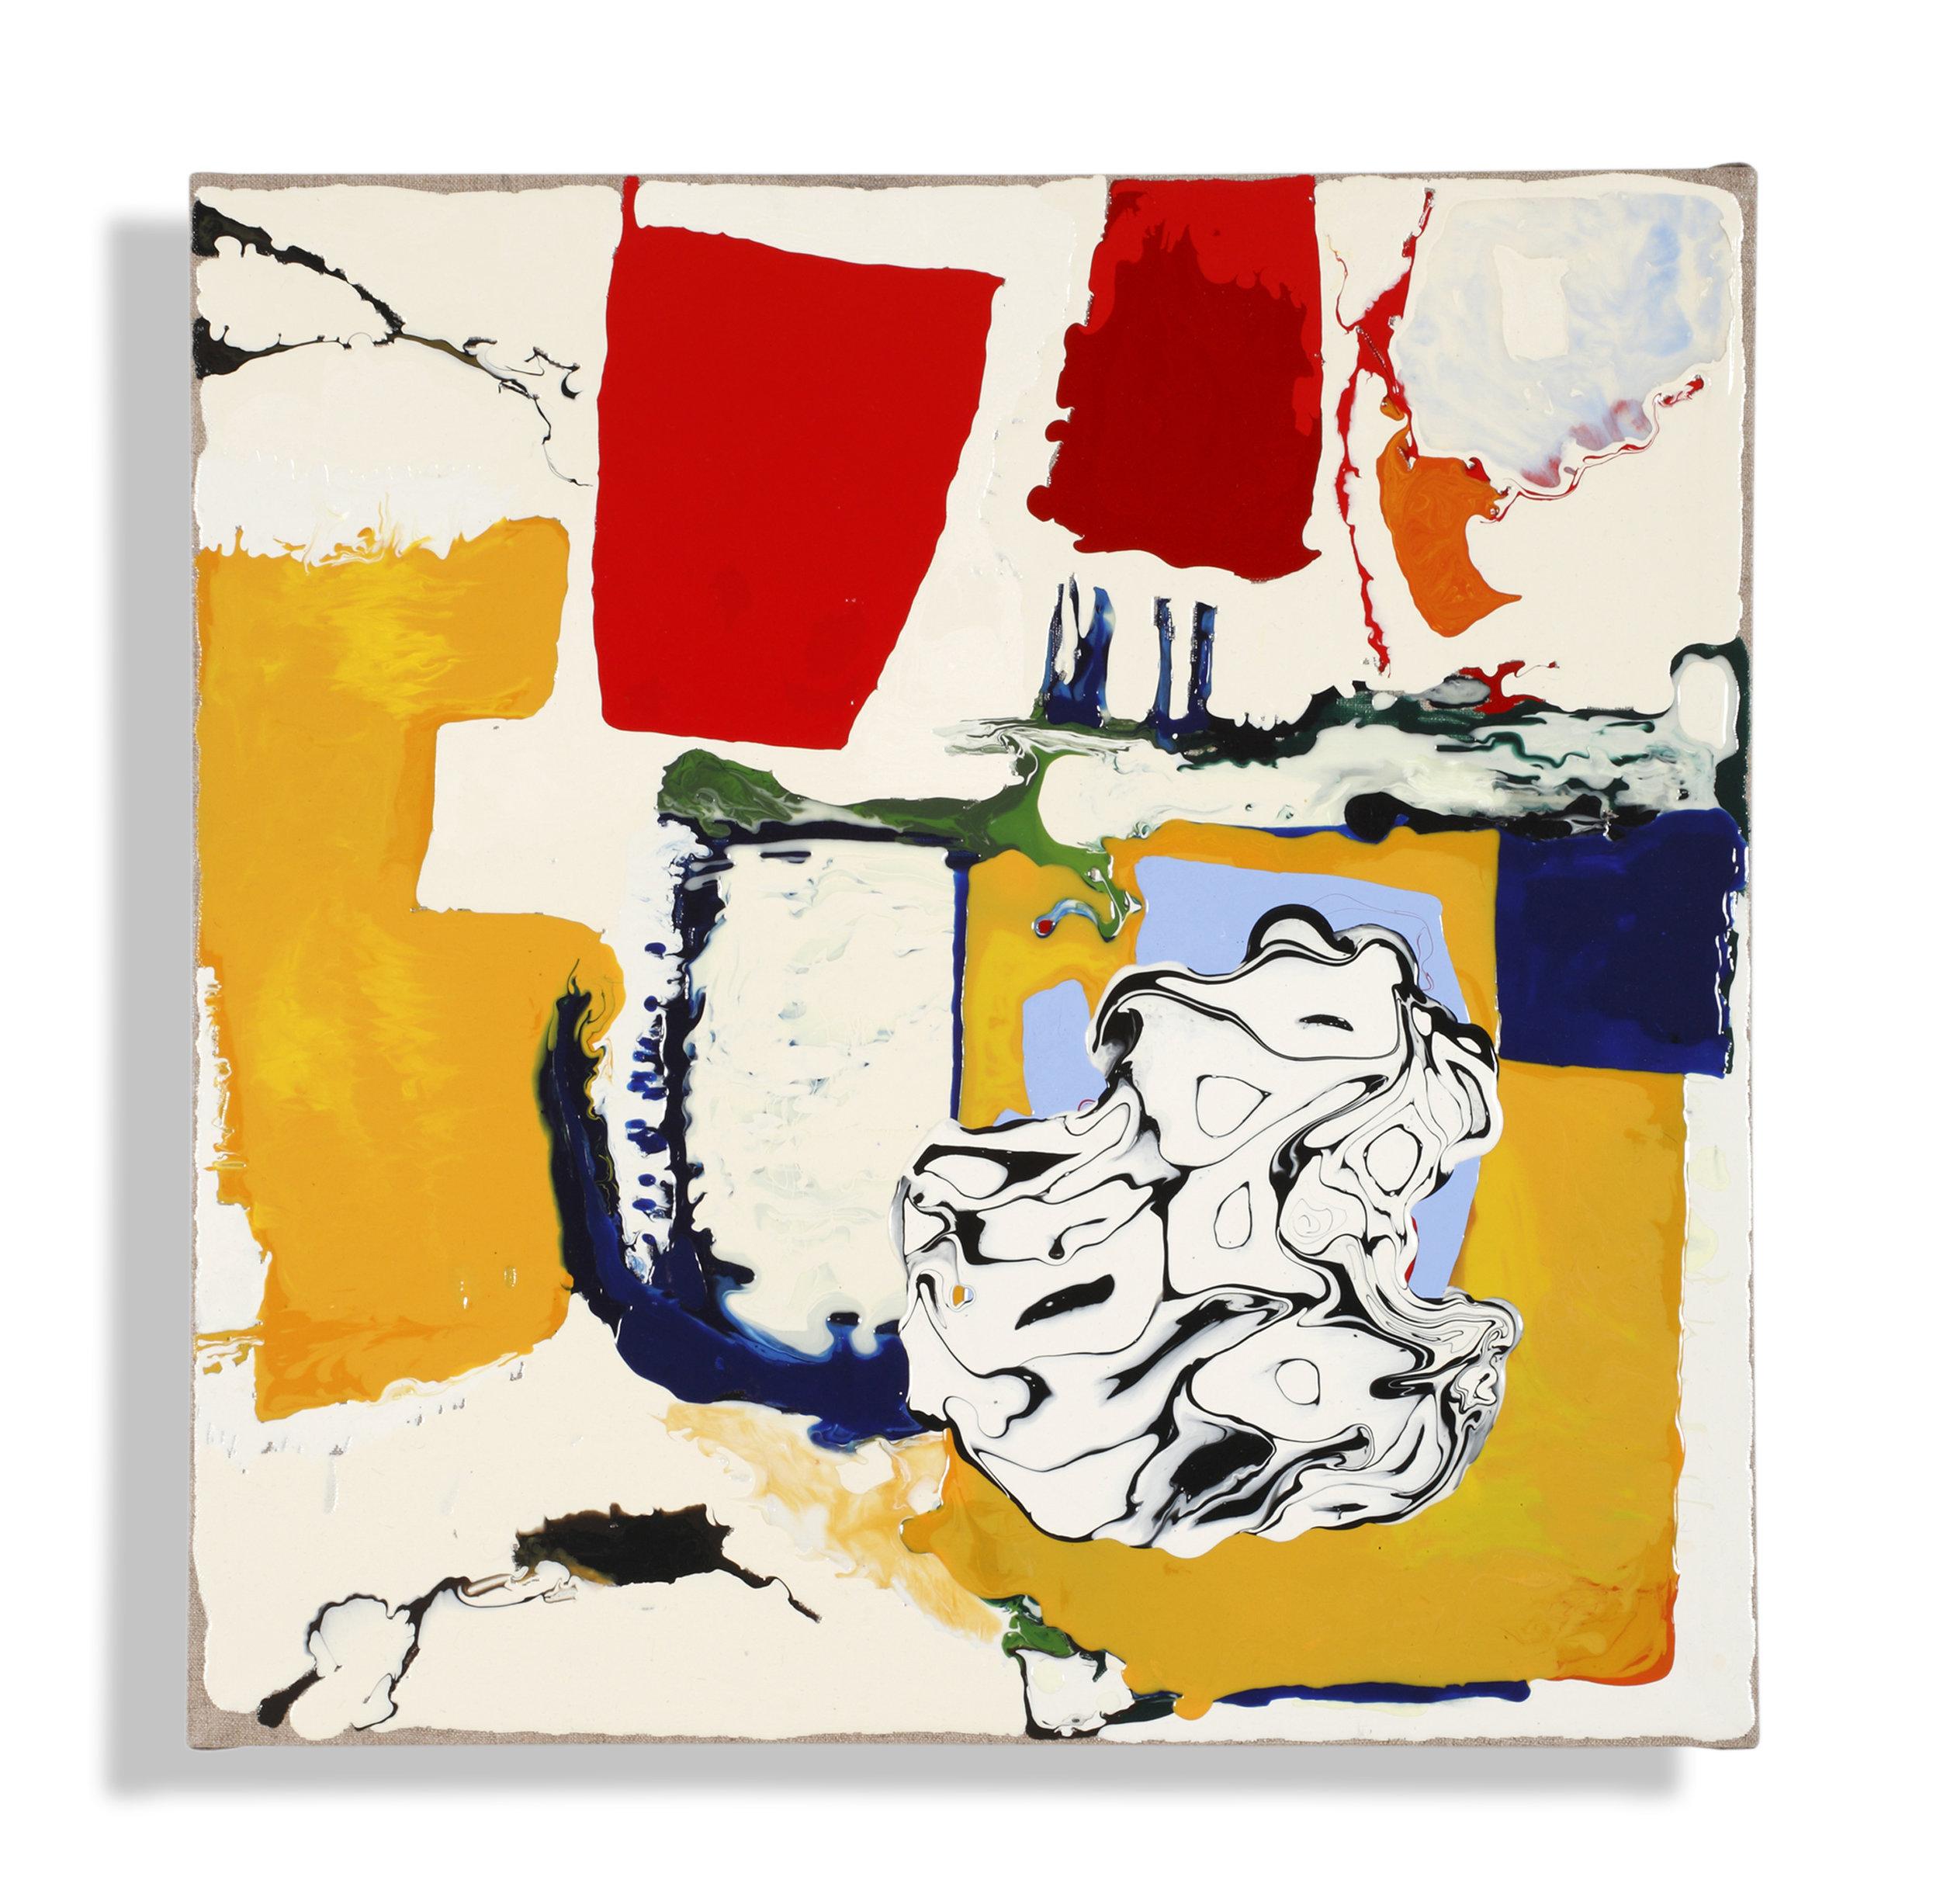 "Color Study, (inspired by Richard Diebenkorn,) acrylic medium on linen, 23 x 23 x 2.75"", $1,500"